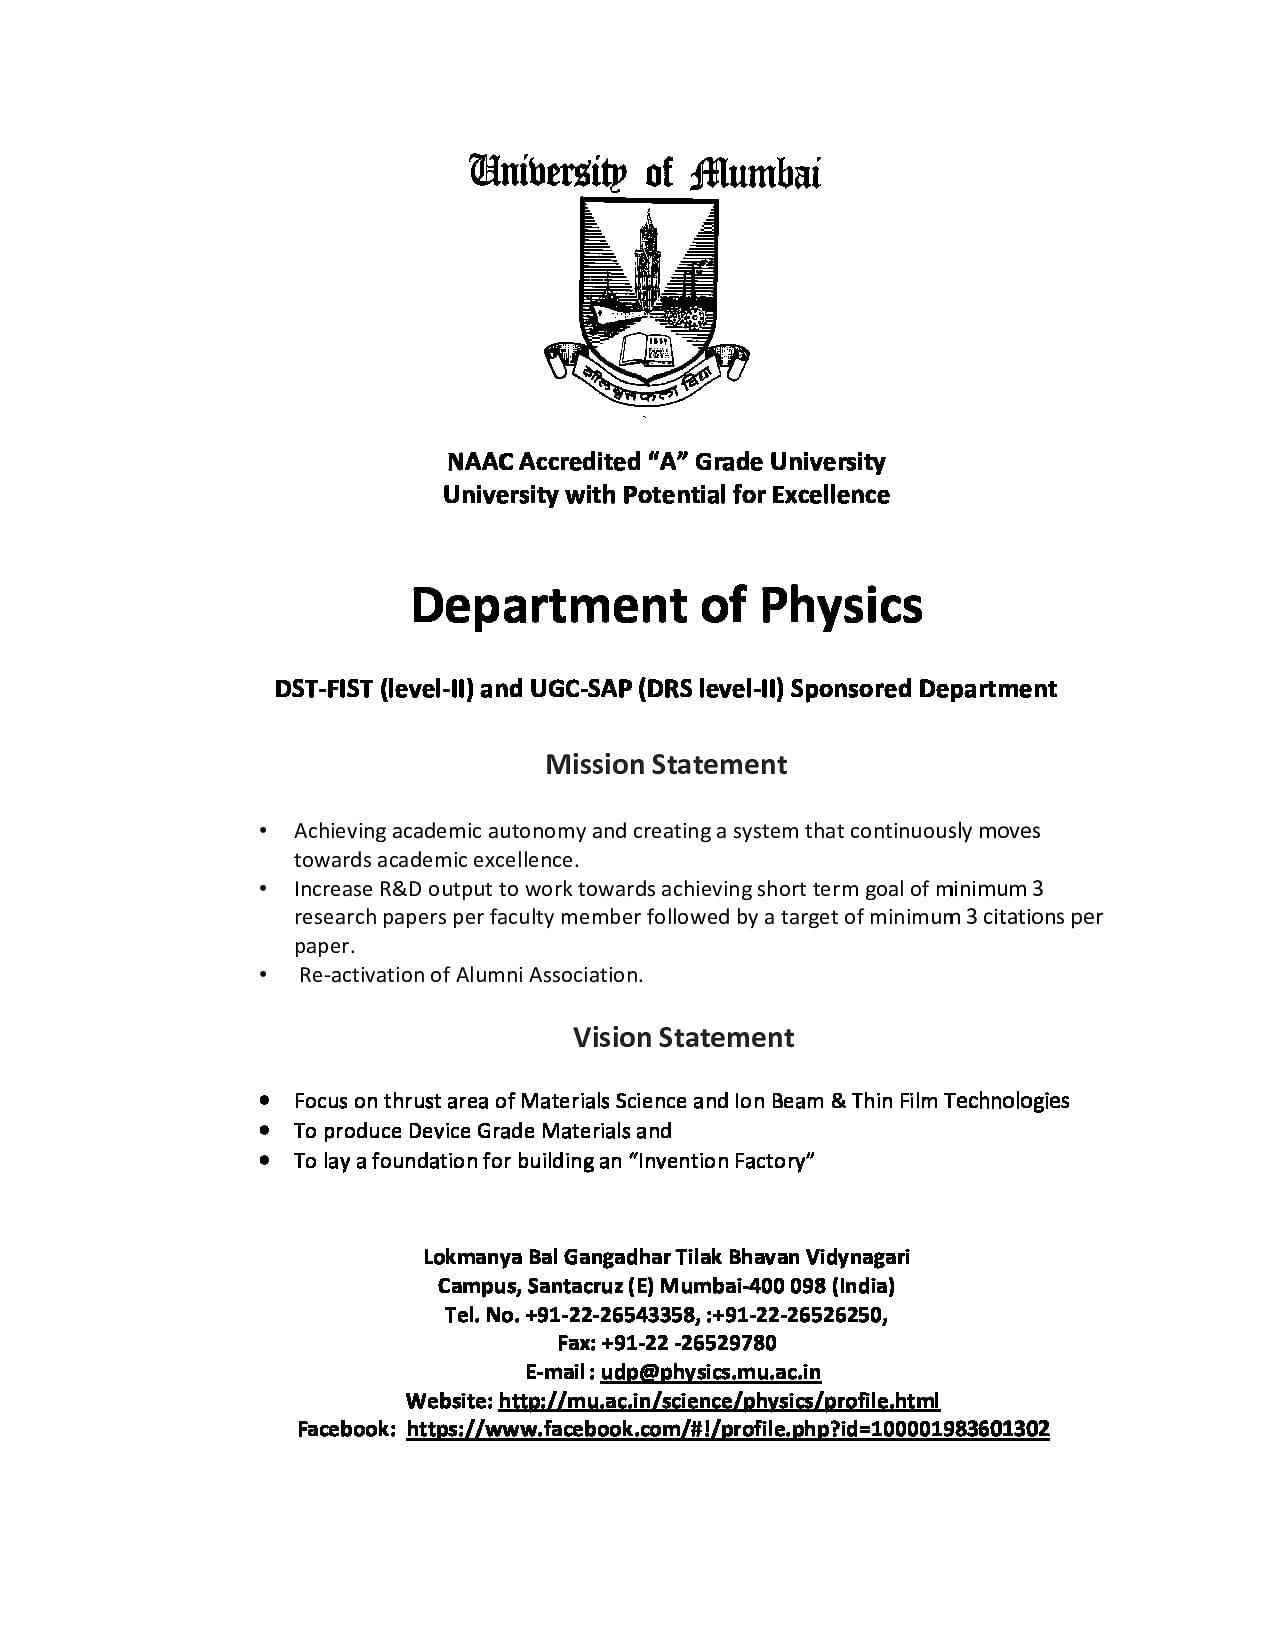 University of mumbai mumbai admissions contact website 2016brochure malvernweather Choice Image